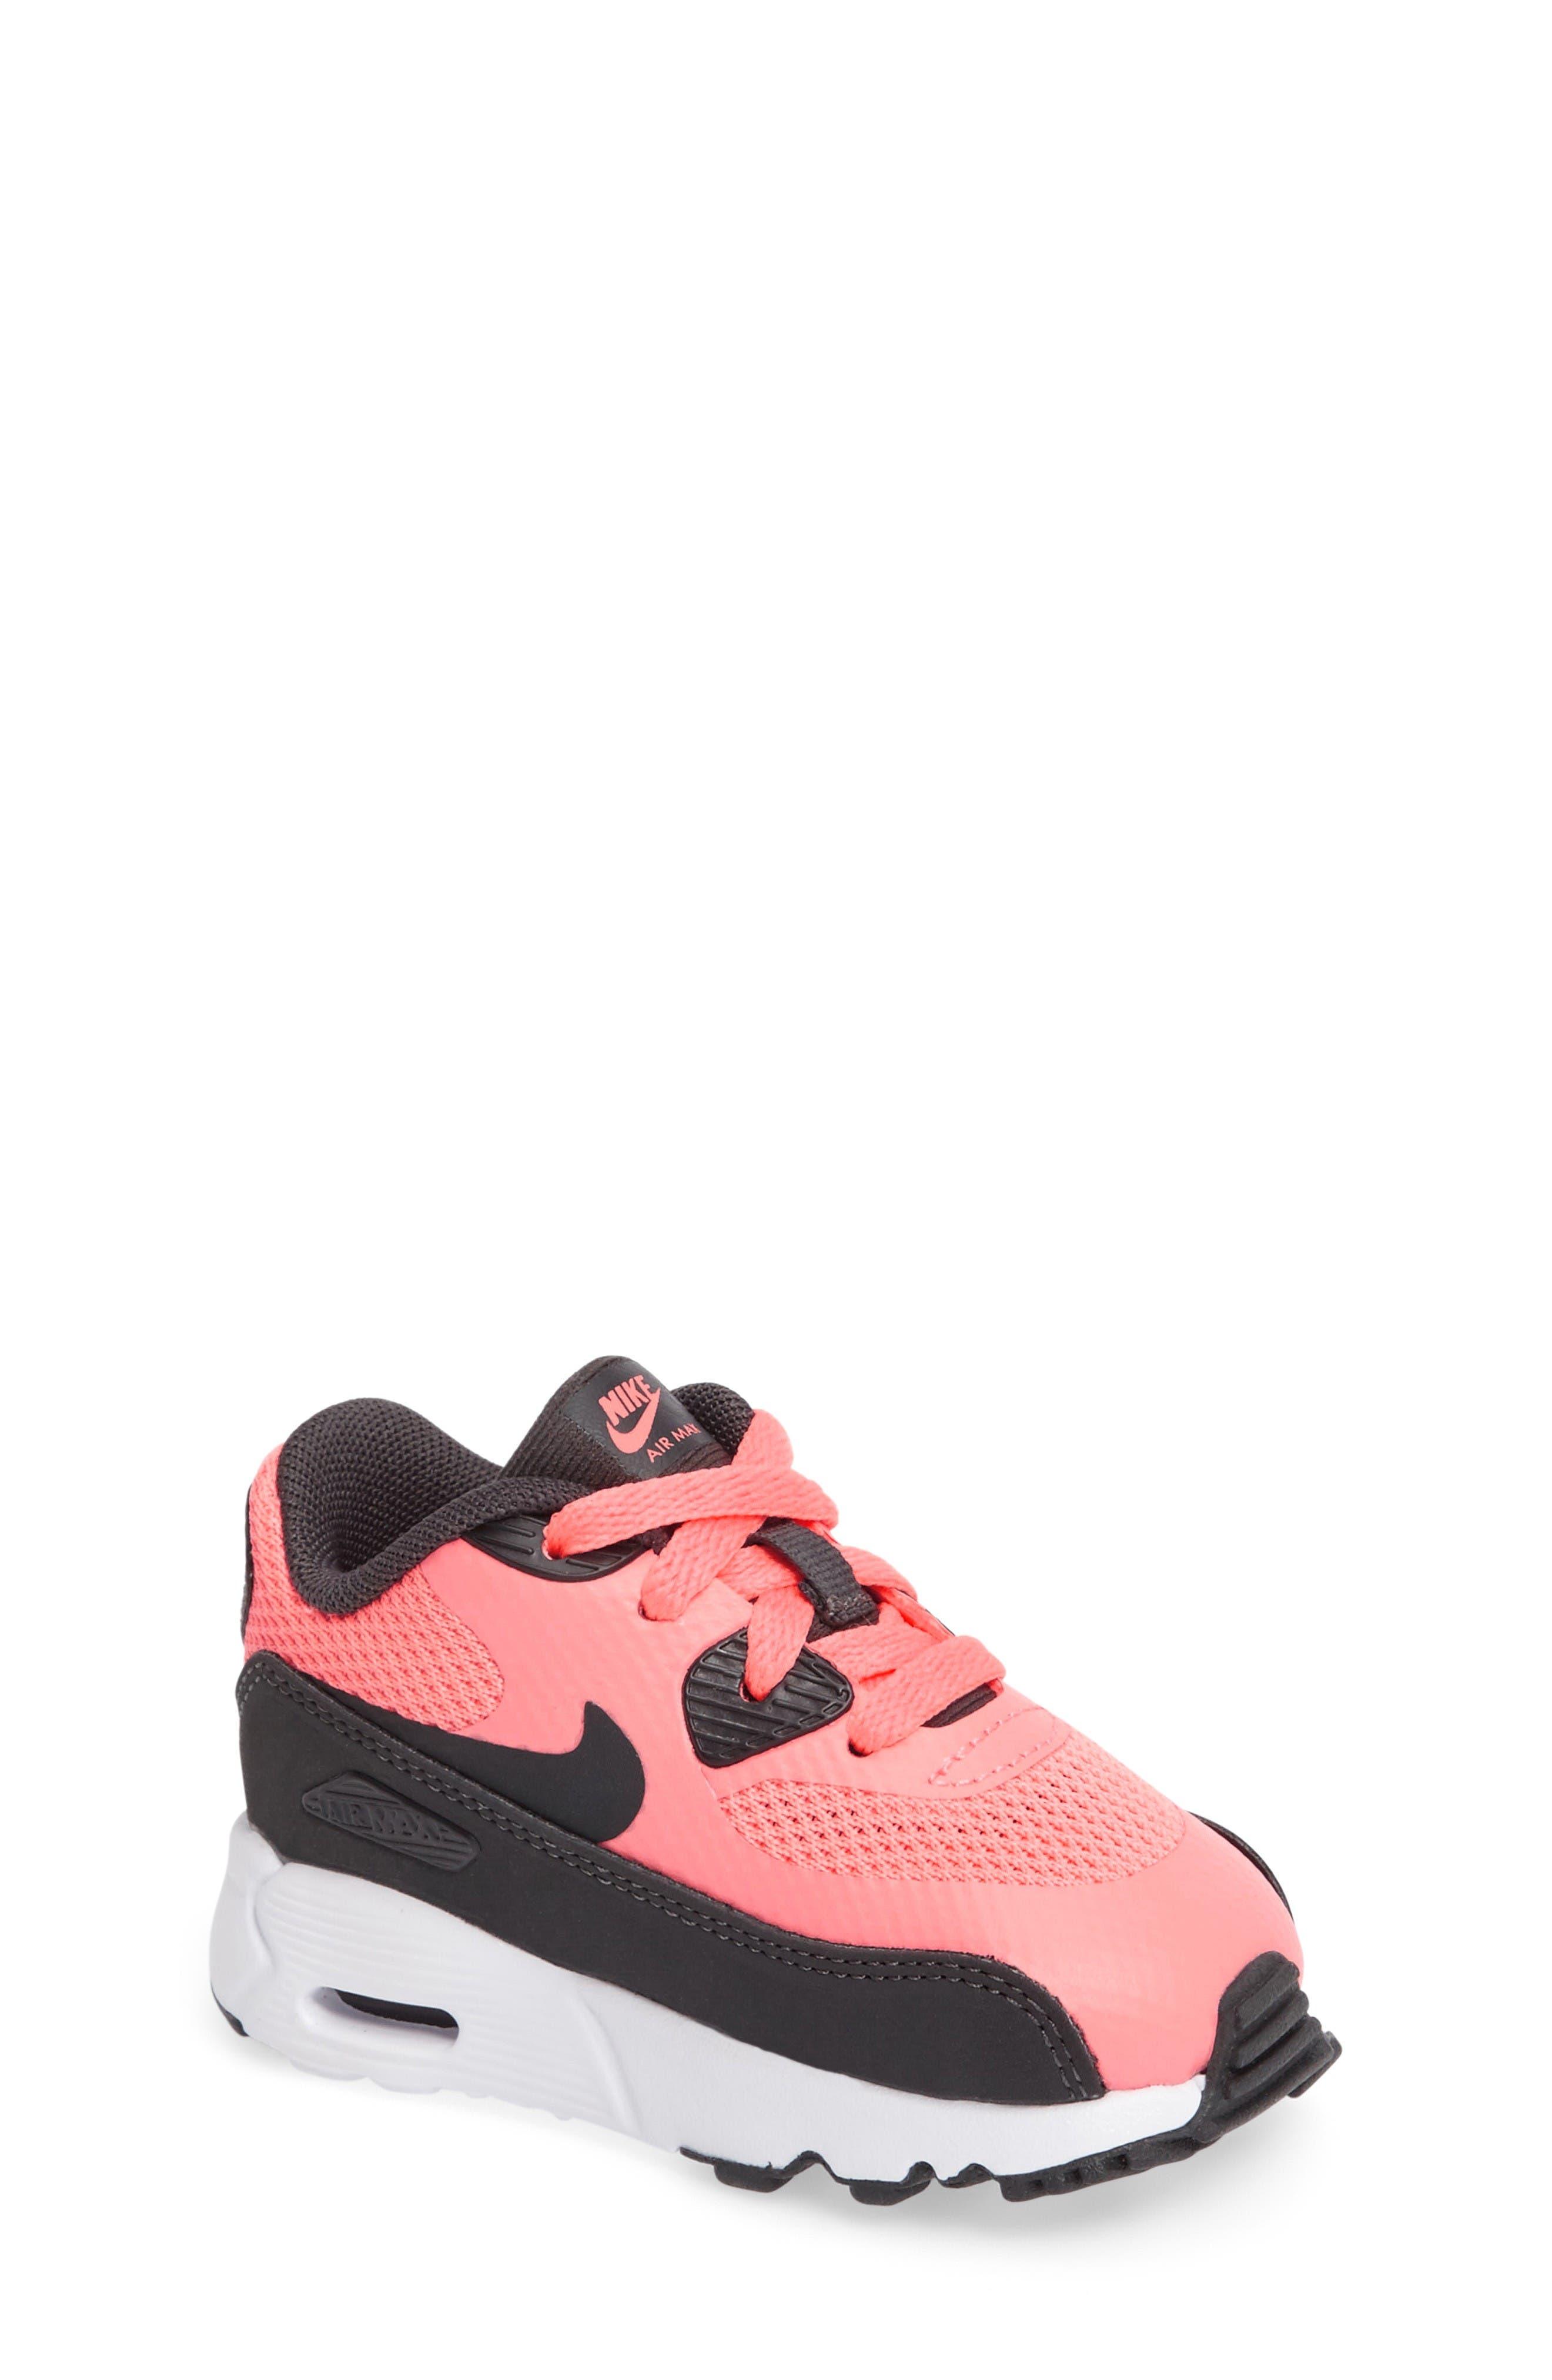 Nike Air Max 90 Ultra 2.0 Sneaker (Baby, Walker & Toddler)